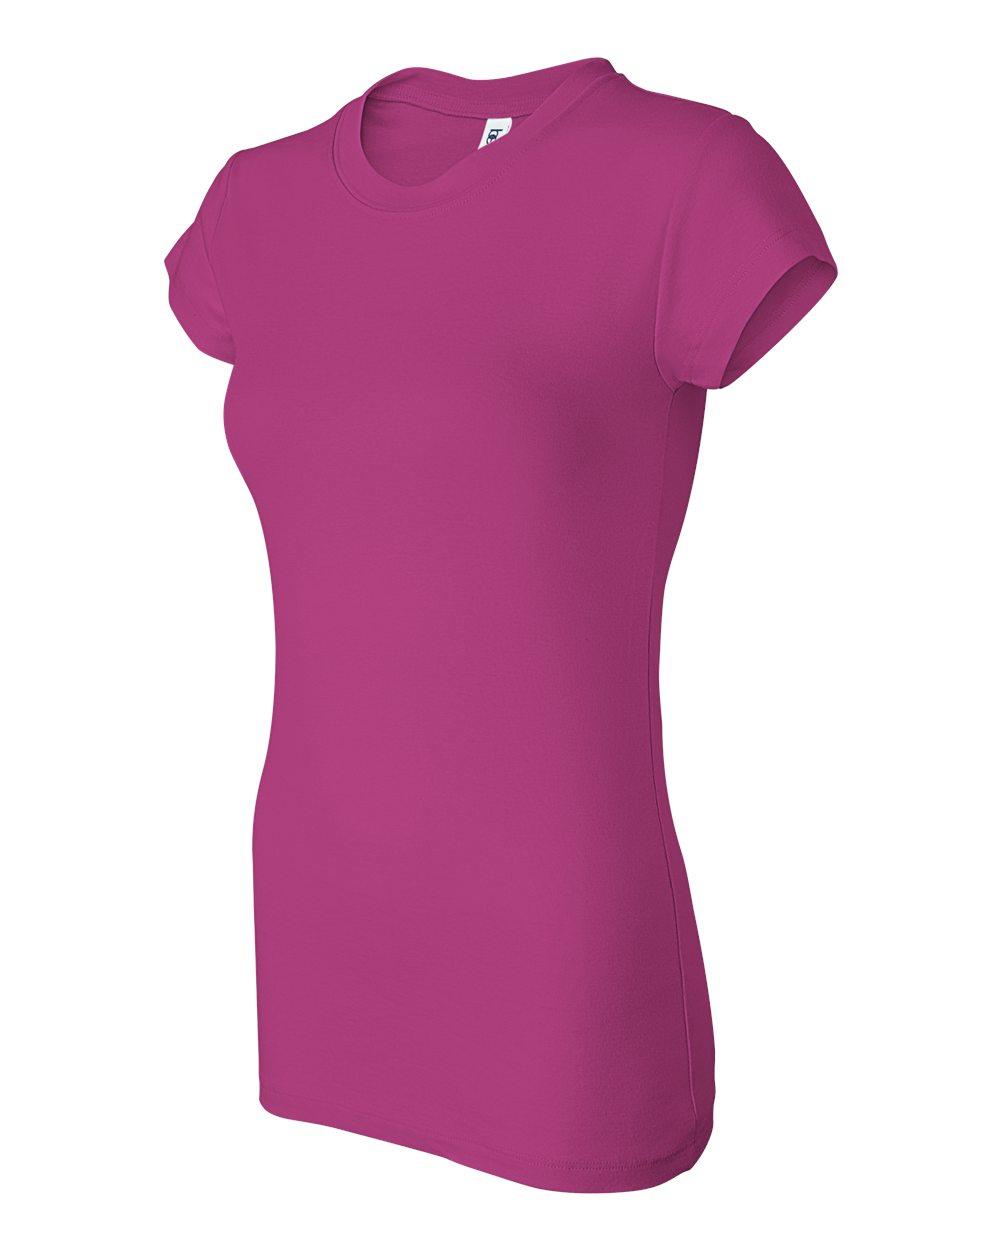 Bella-Canvas-Women-039-s-Sheer-Mini-Rib-Short-Sleeve-T-Shirt-8701-S-2XL thumbnail 15